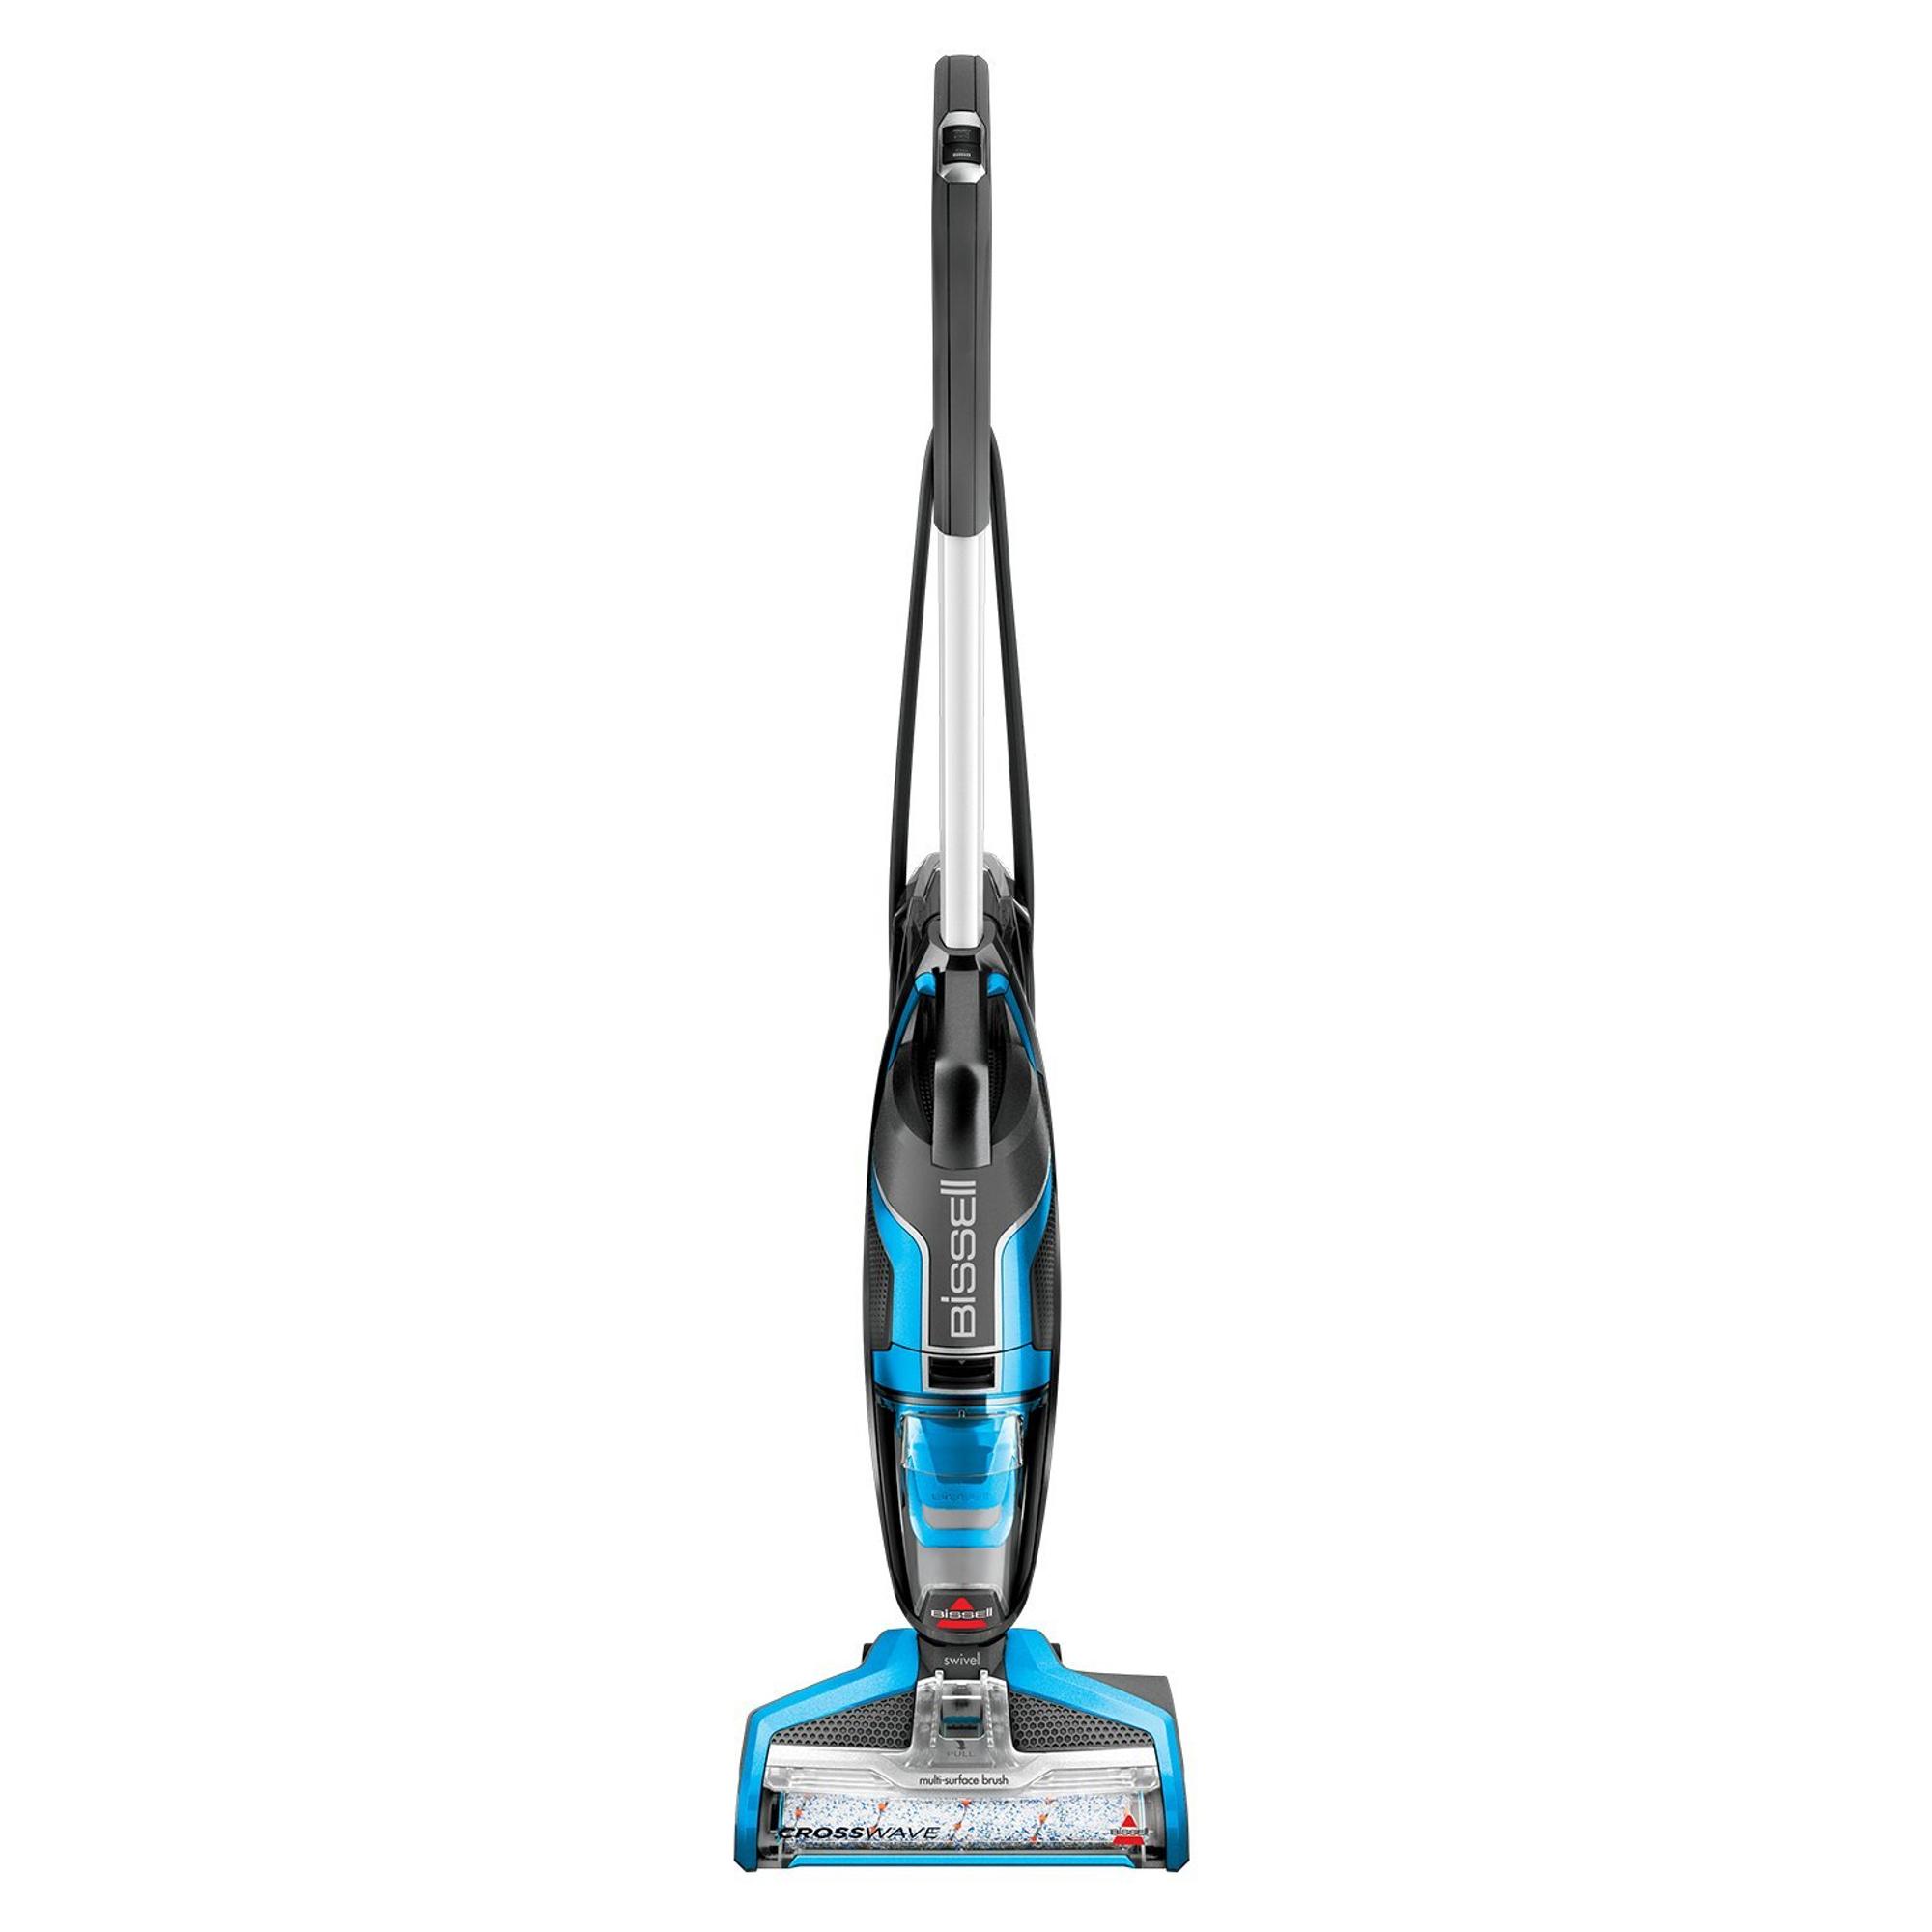 Bissell 1713 Crosswave Multi Surface Floor Cleaner Blue